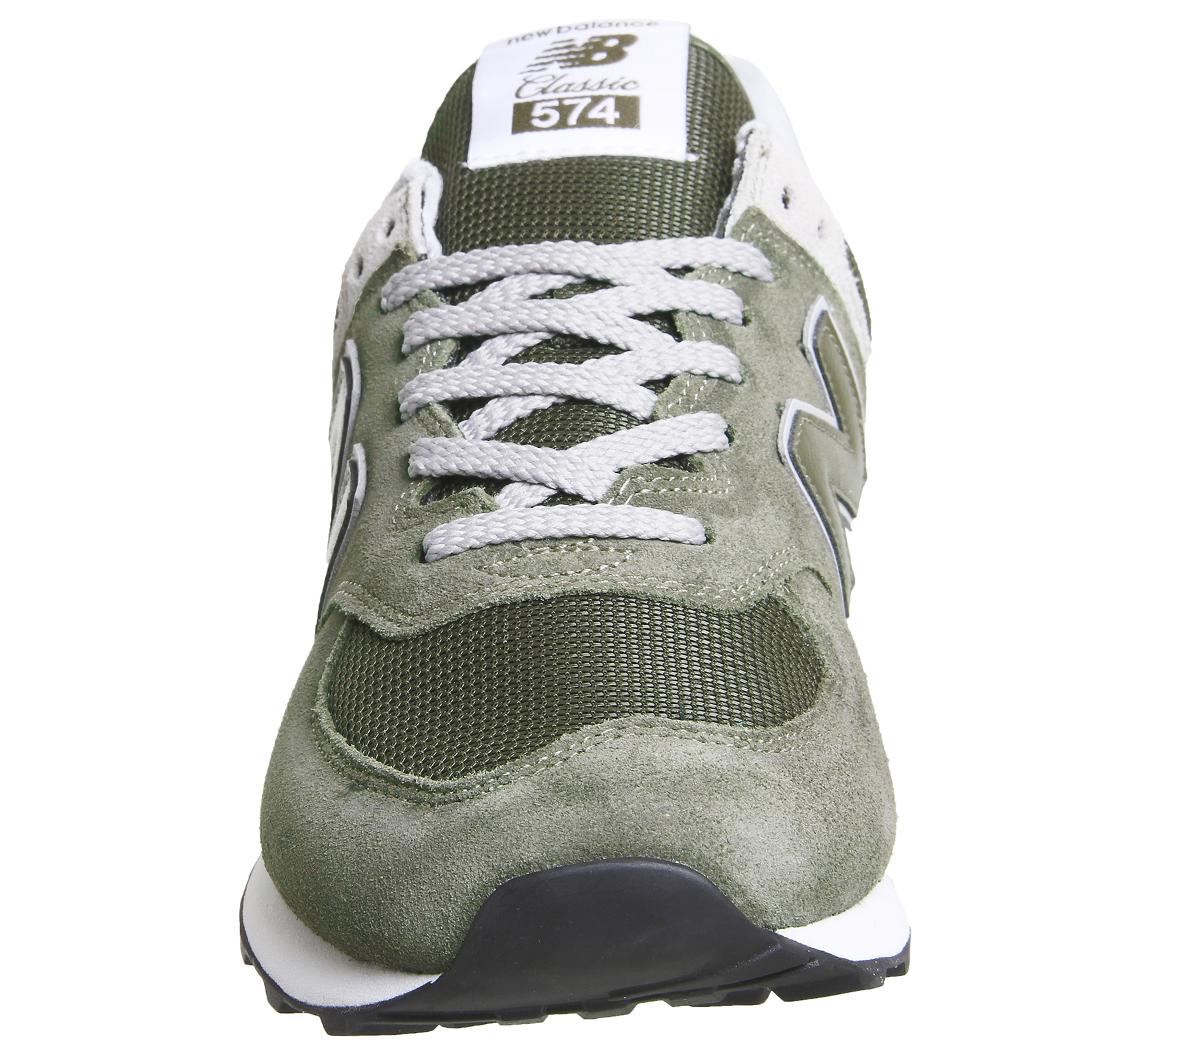 d38abe70d 574-Tenis-Caqui-Tenis-New-Balance-Zapatos miniatura 3